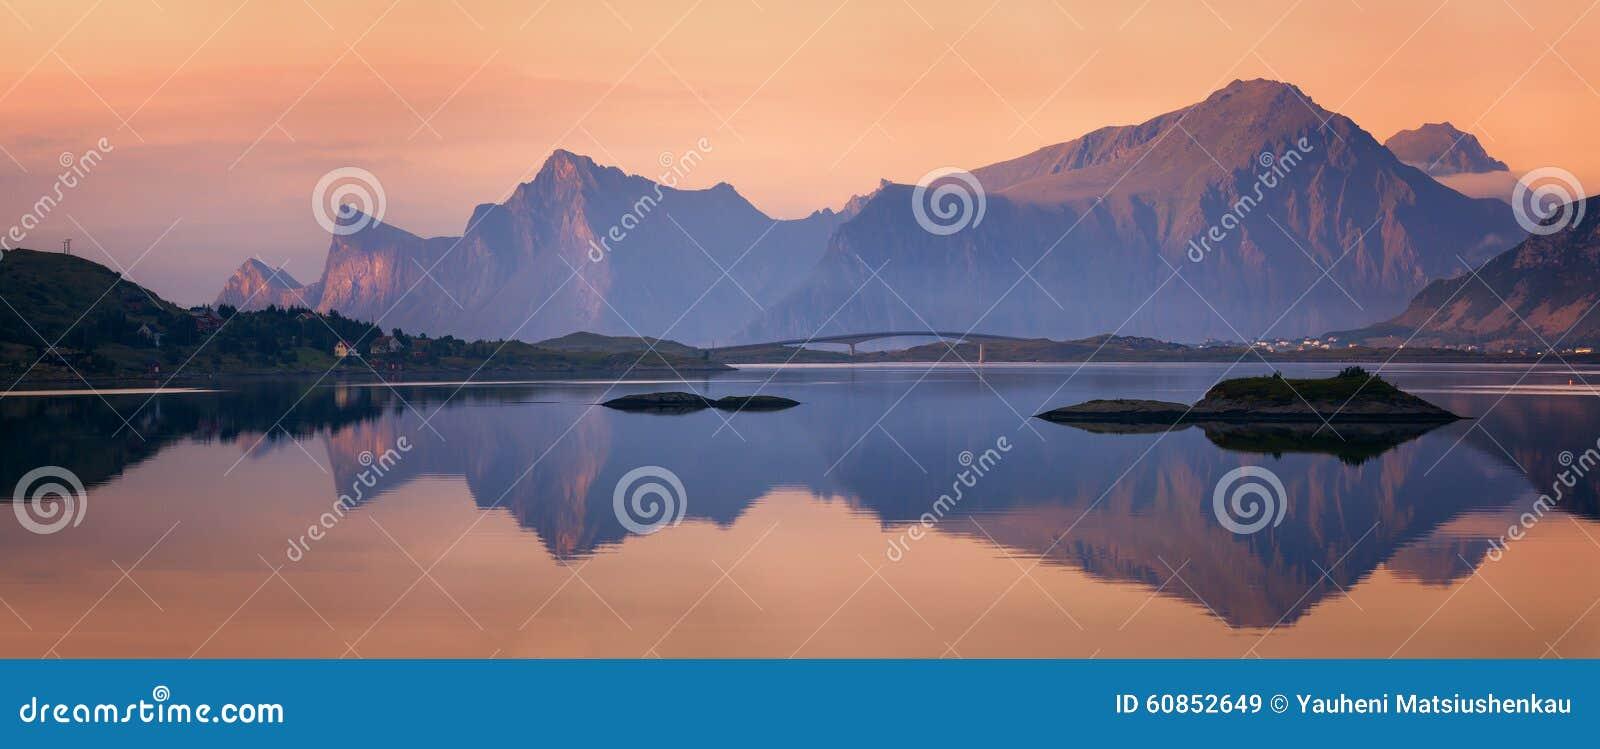 Lofoten海岛,挪威日落全景